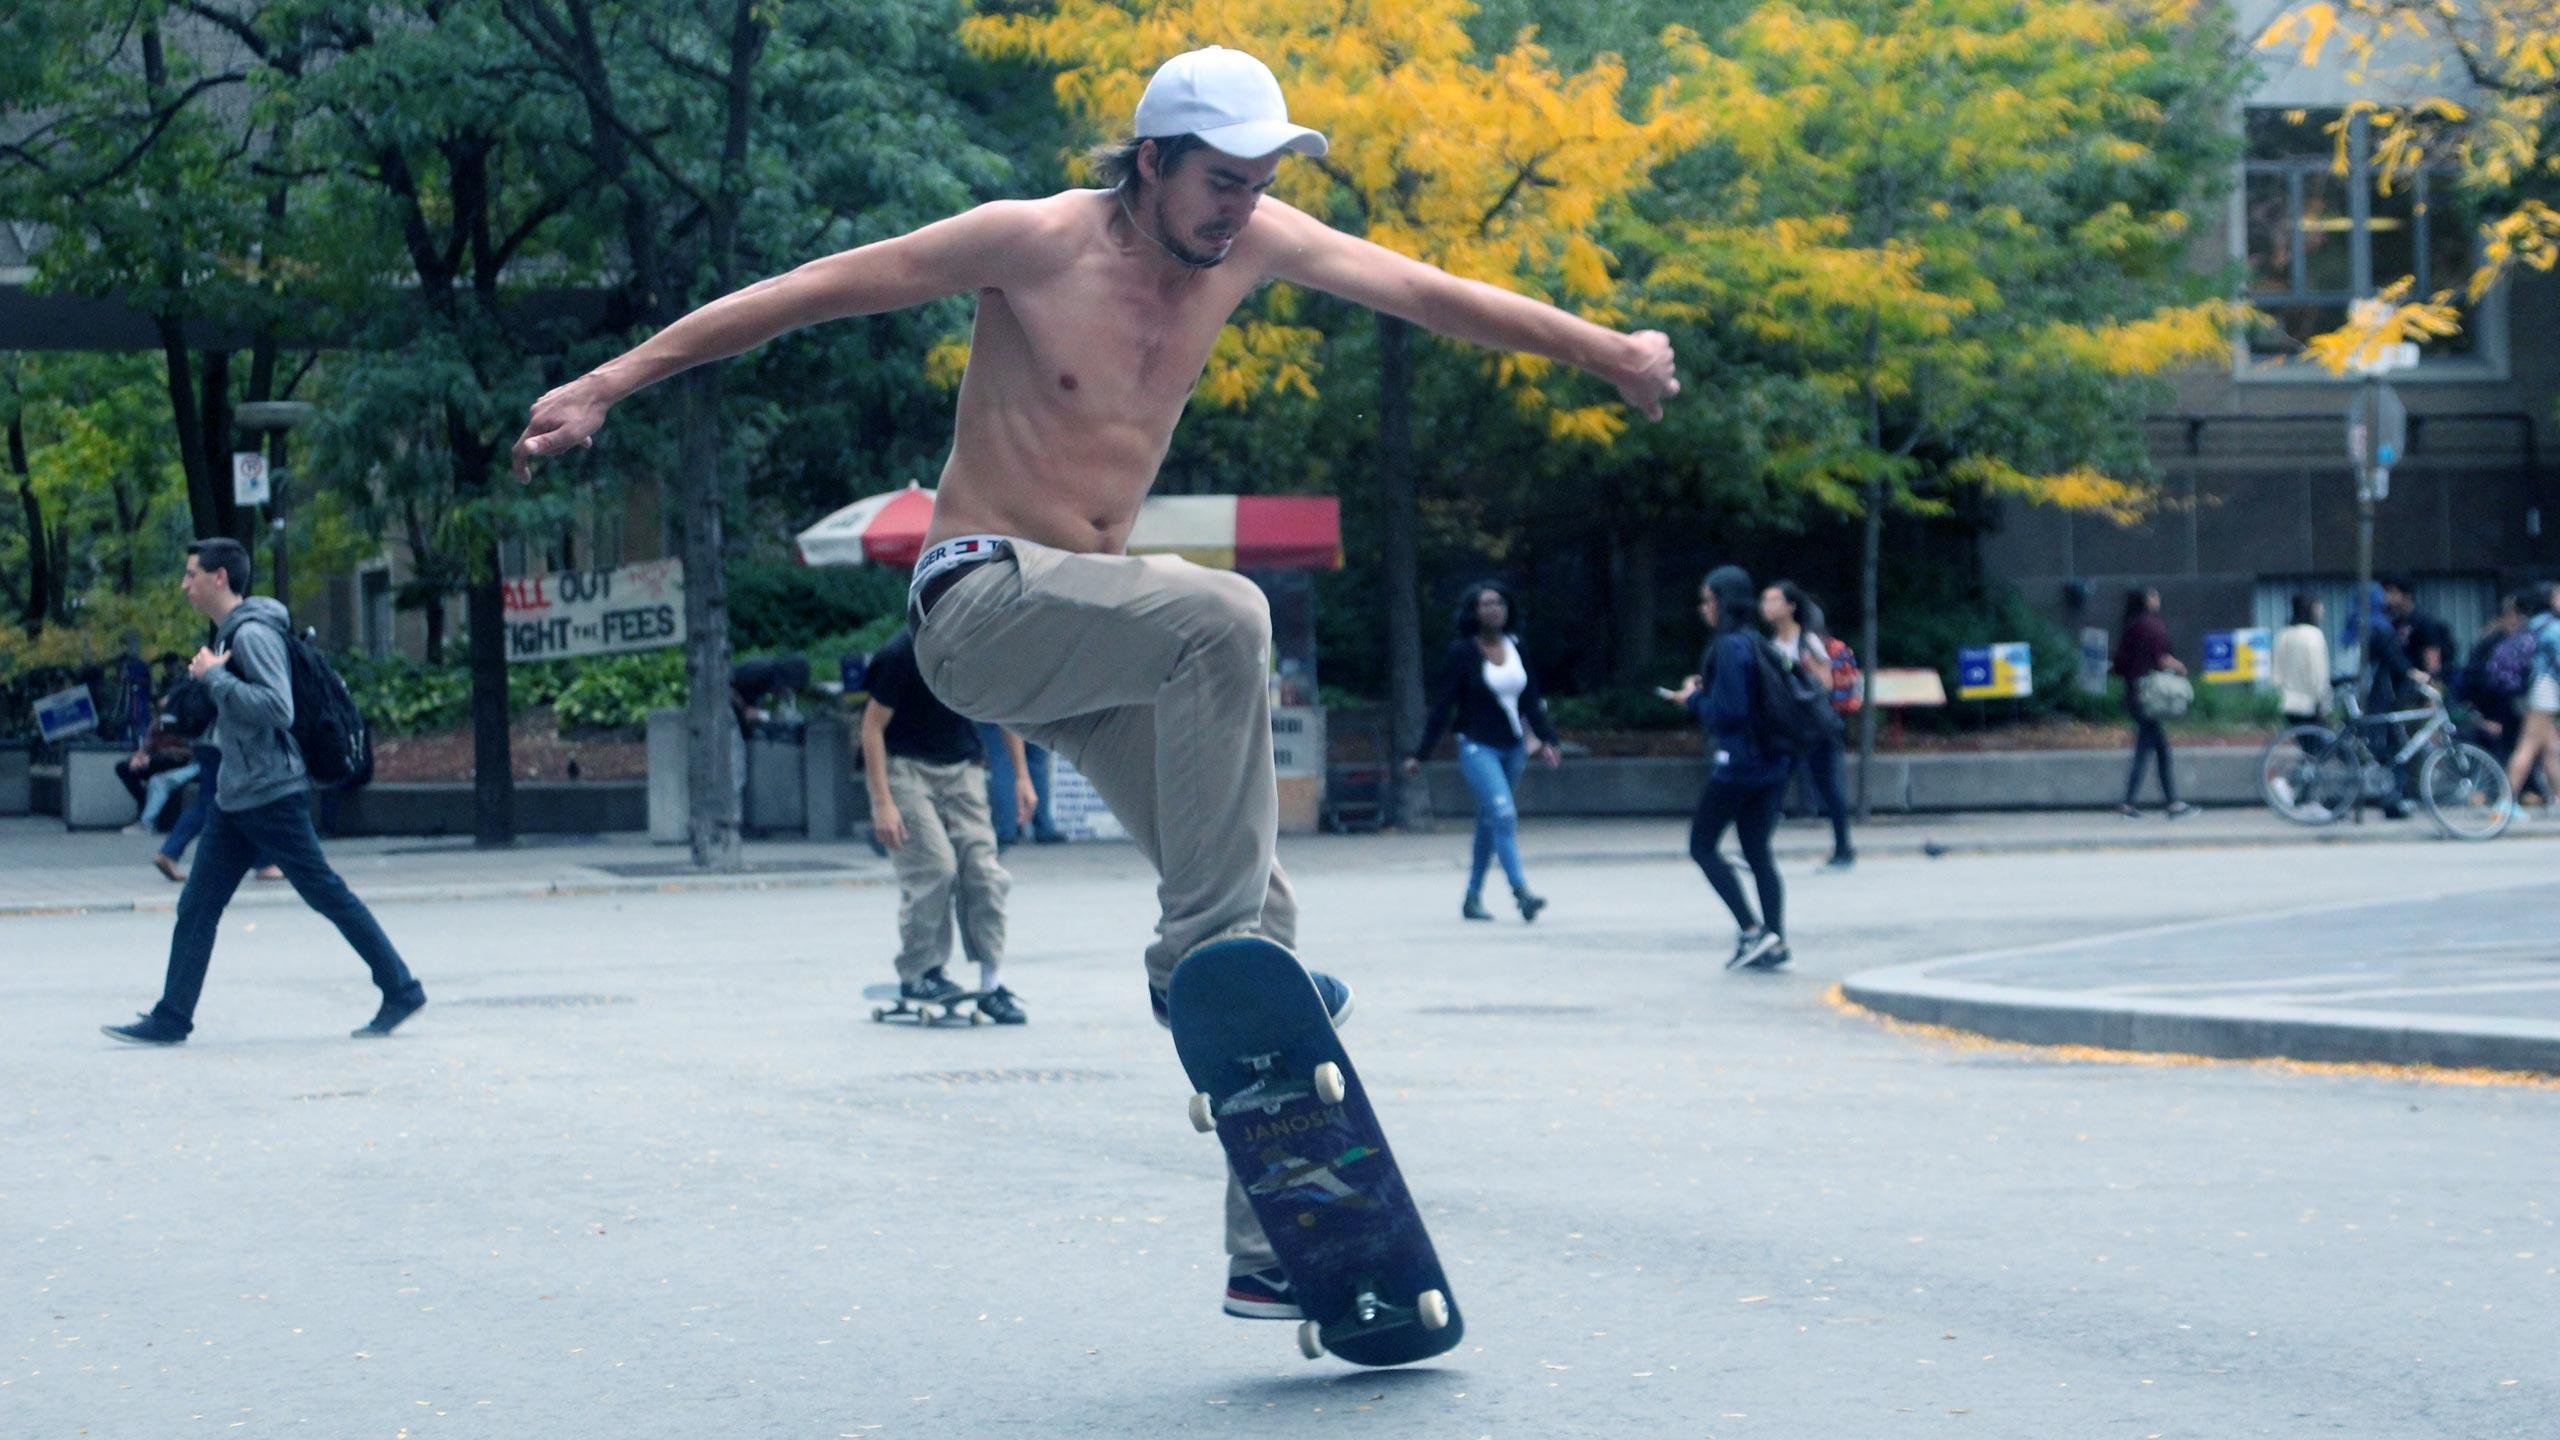 oct18_2016_skateboarding_features_chrisblanchette1